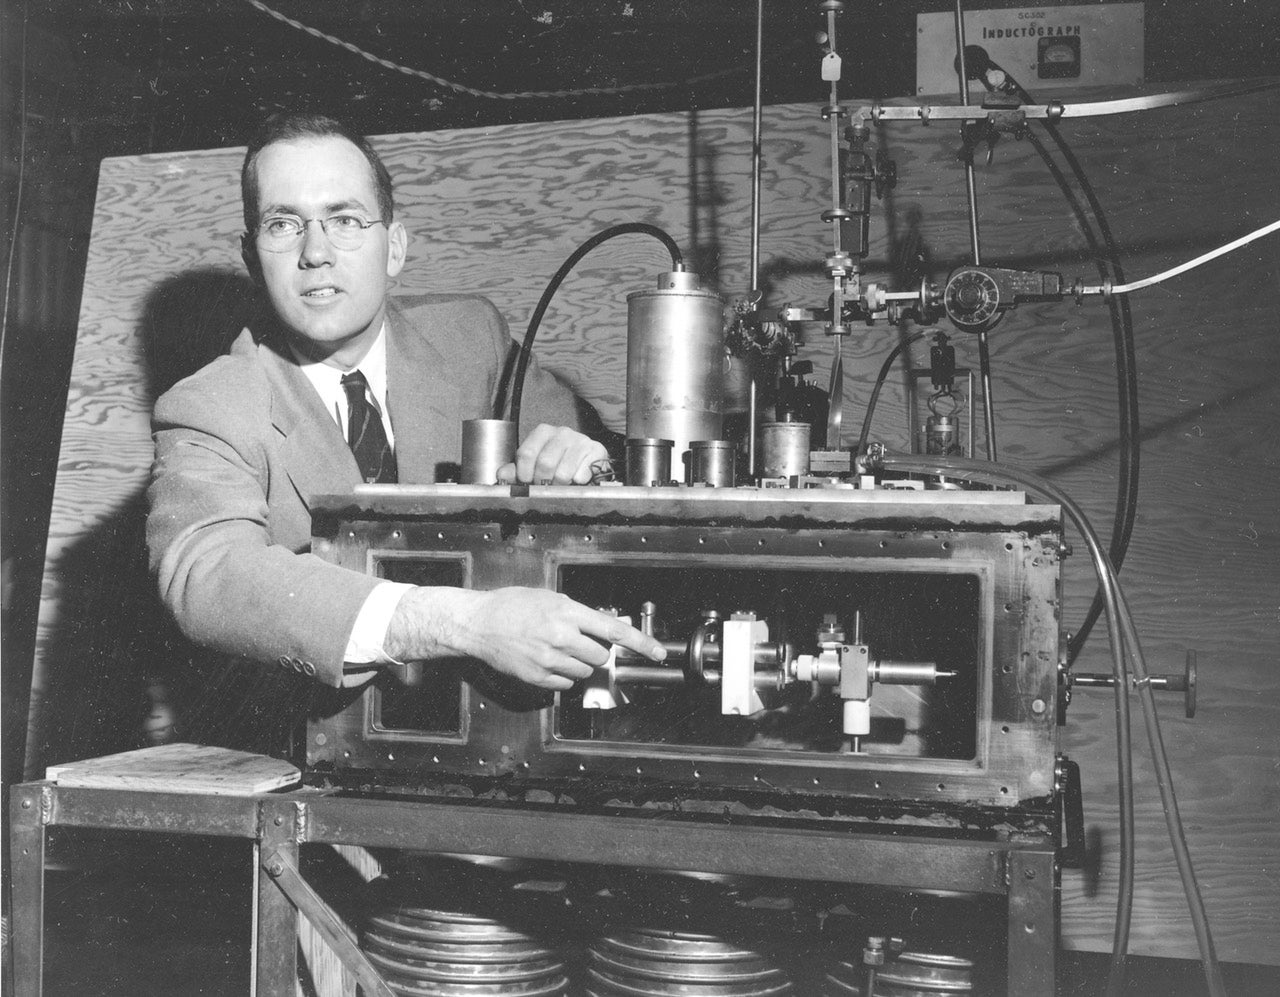 Inventor of the Laser Dies